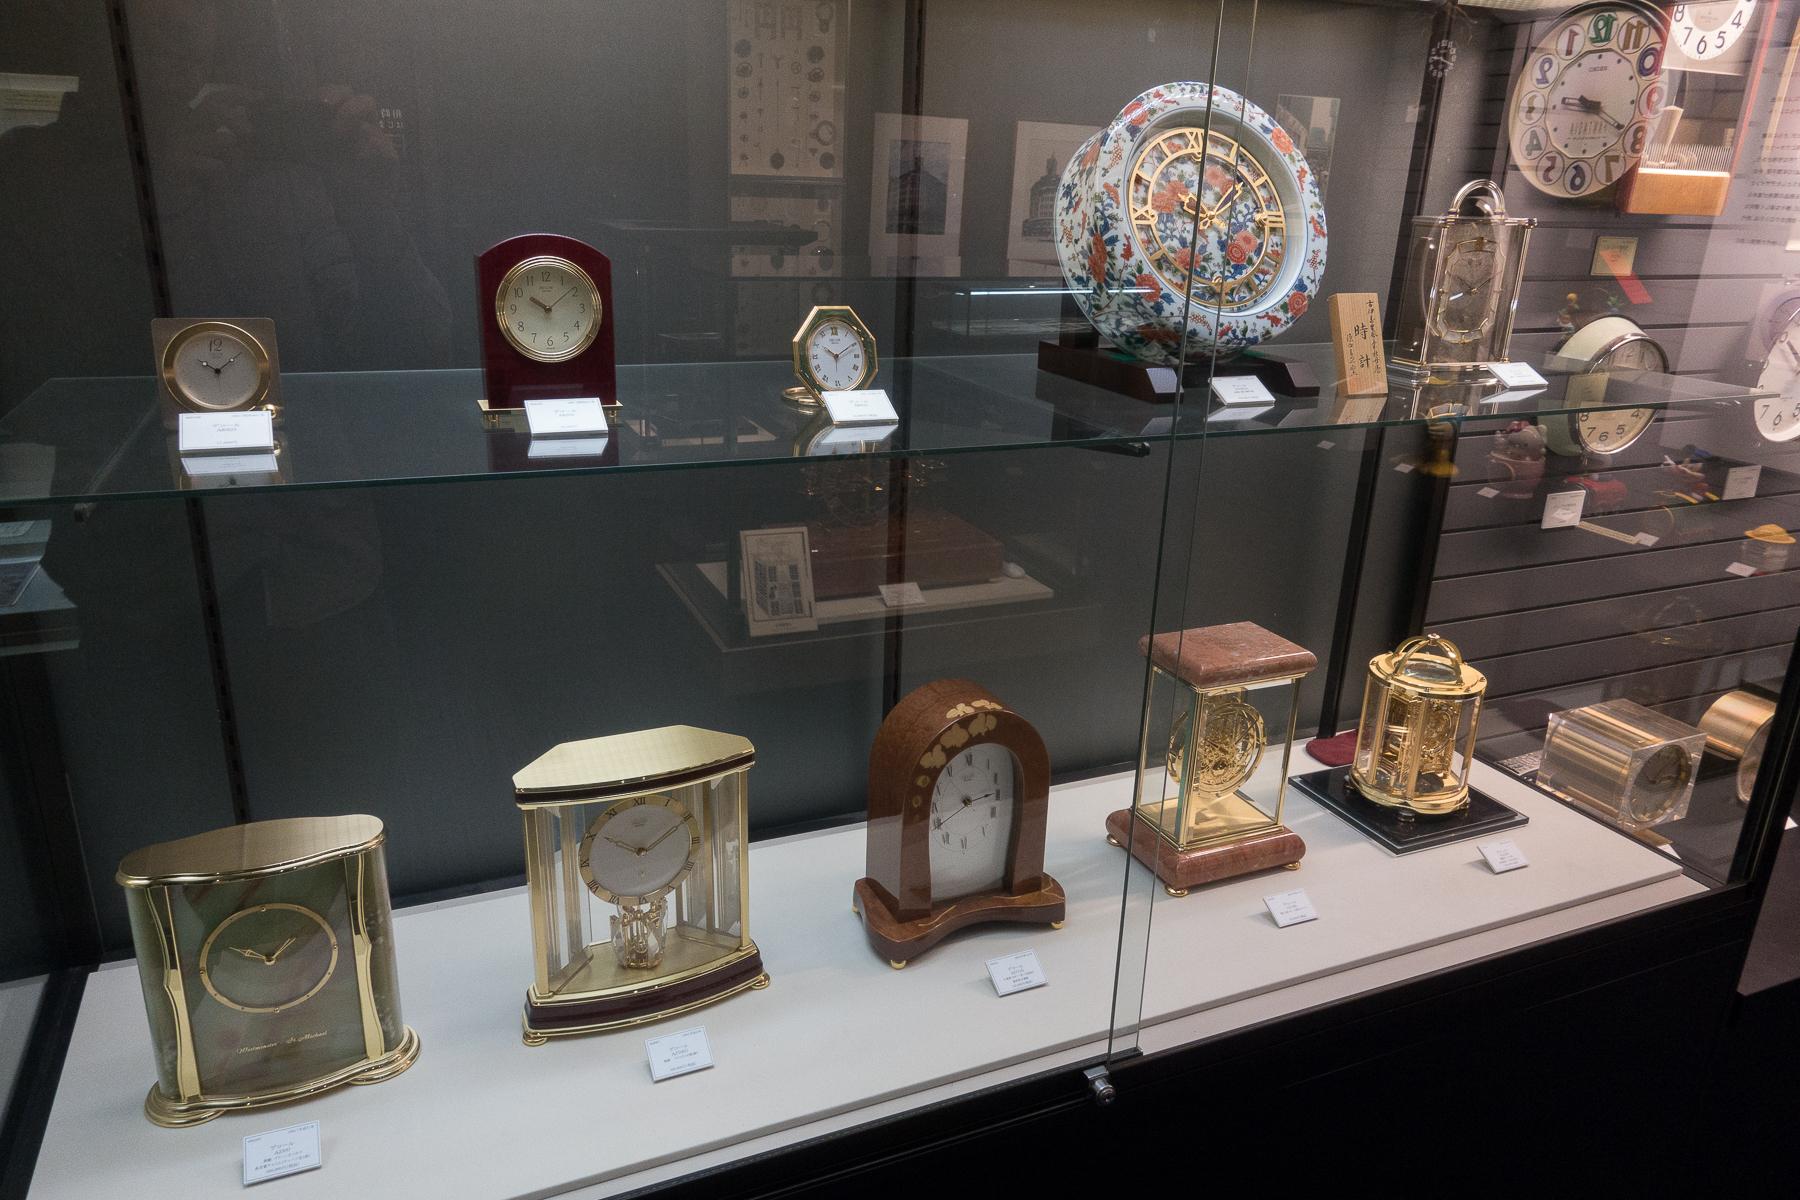 Desk / Table Clocks